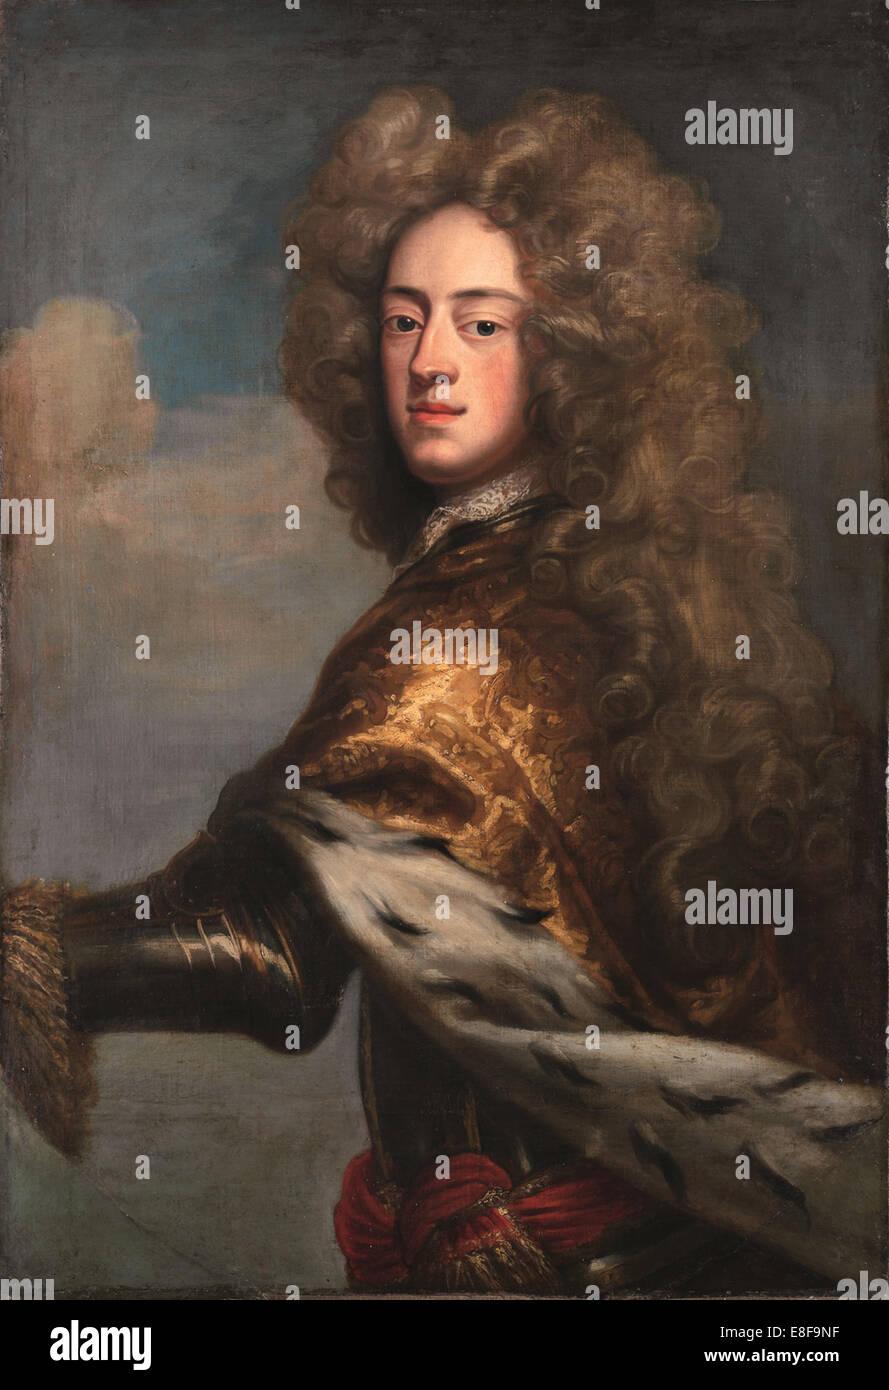 George II as Prince of Wales. Artist: Hirschmann, Johann Leonhard (1672-1750) - Stock Image